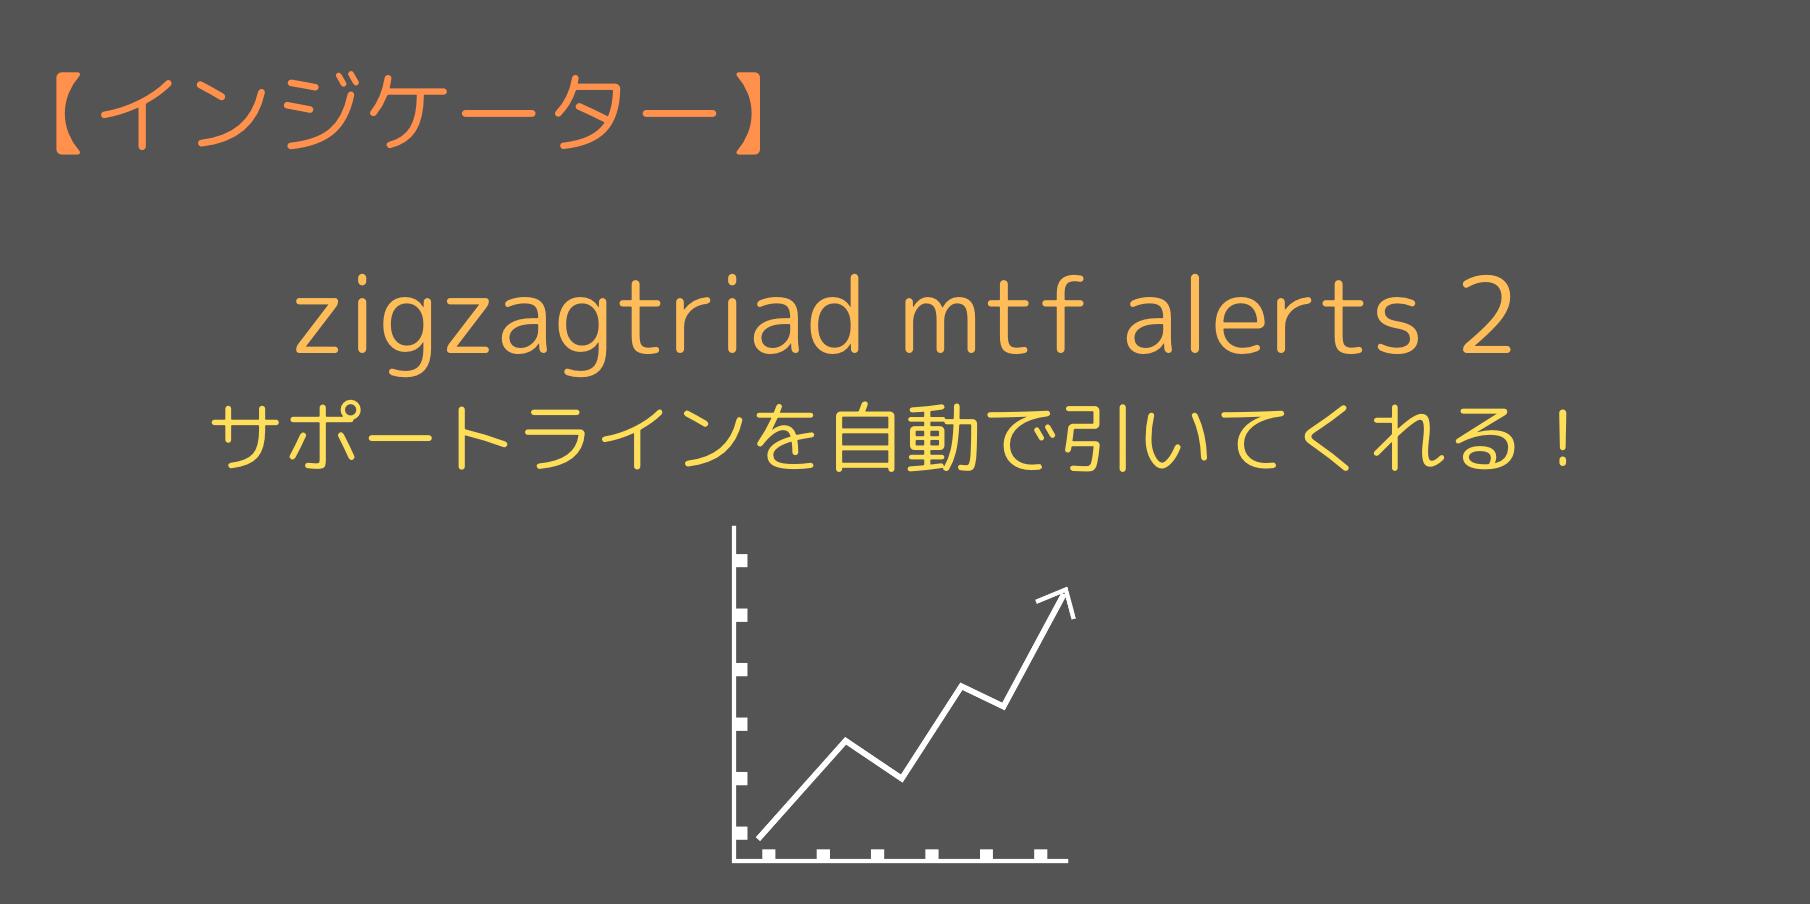 zigzagtriad mtf alerts 2